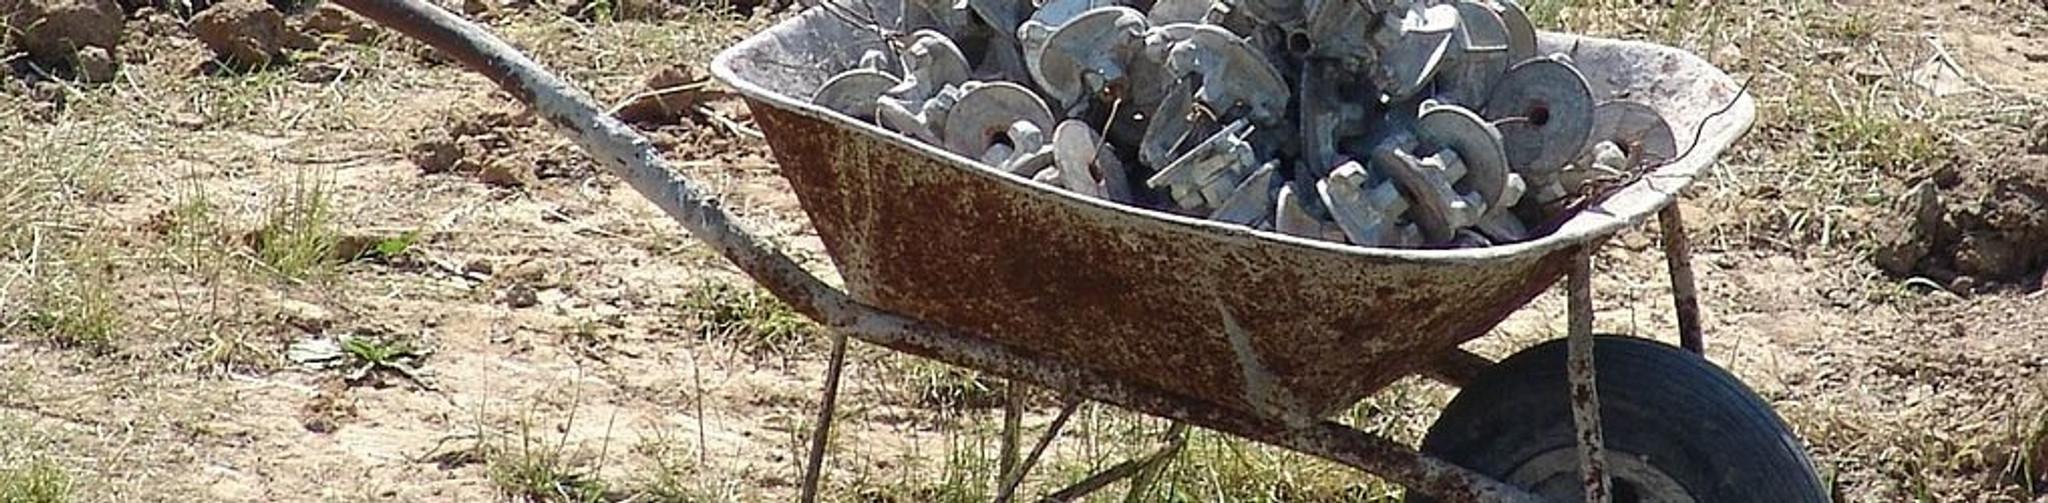 Wheelbarrows, Buckets & Mixers